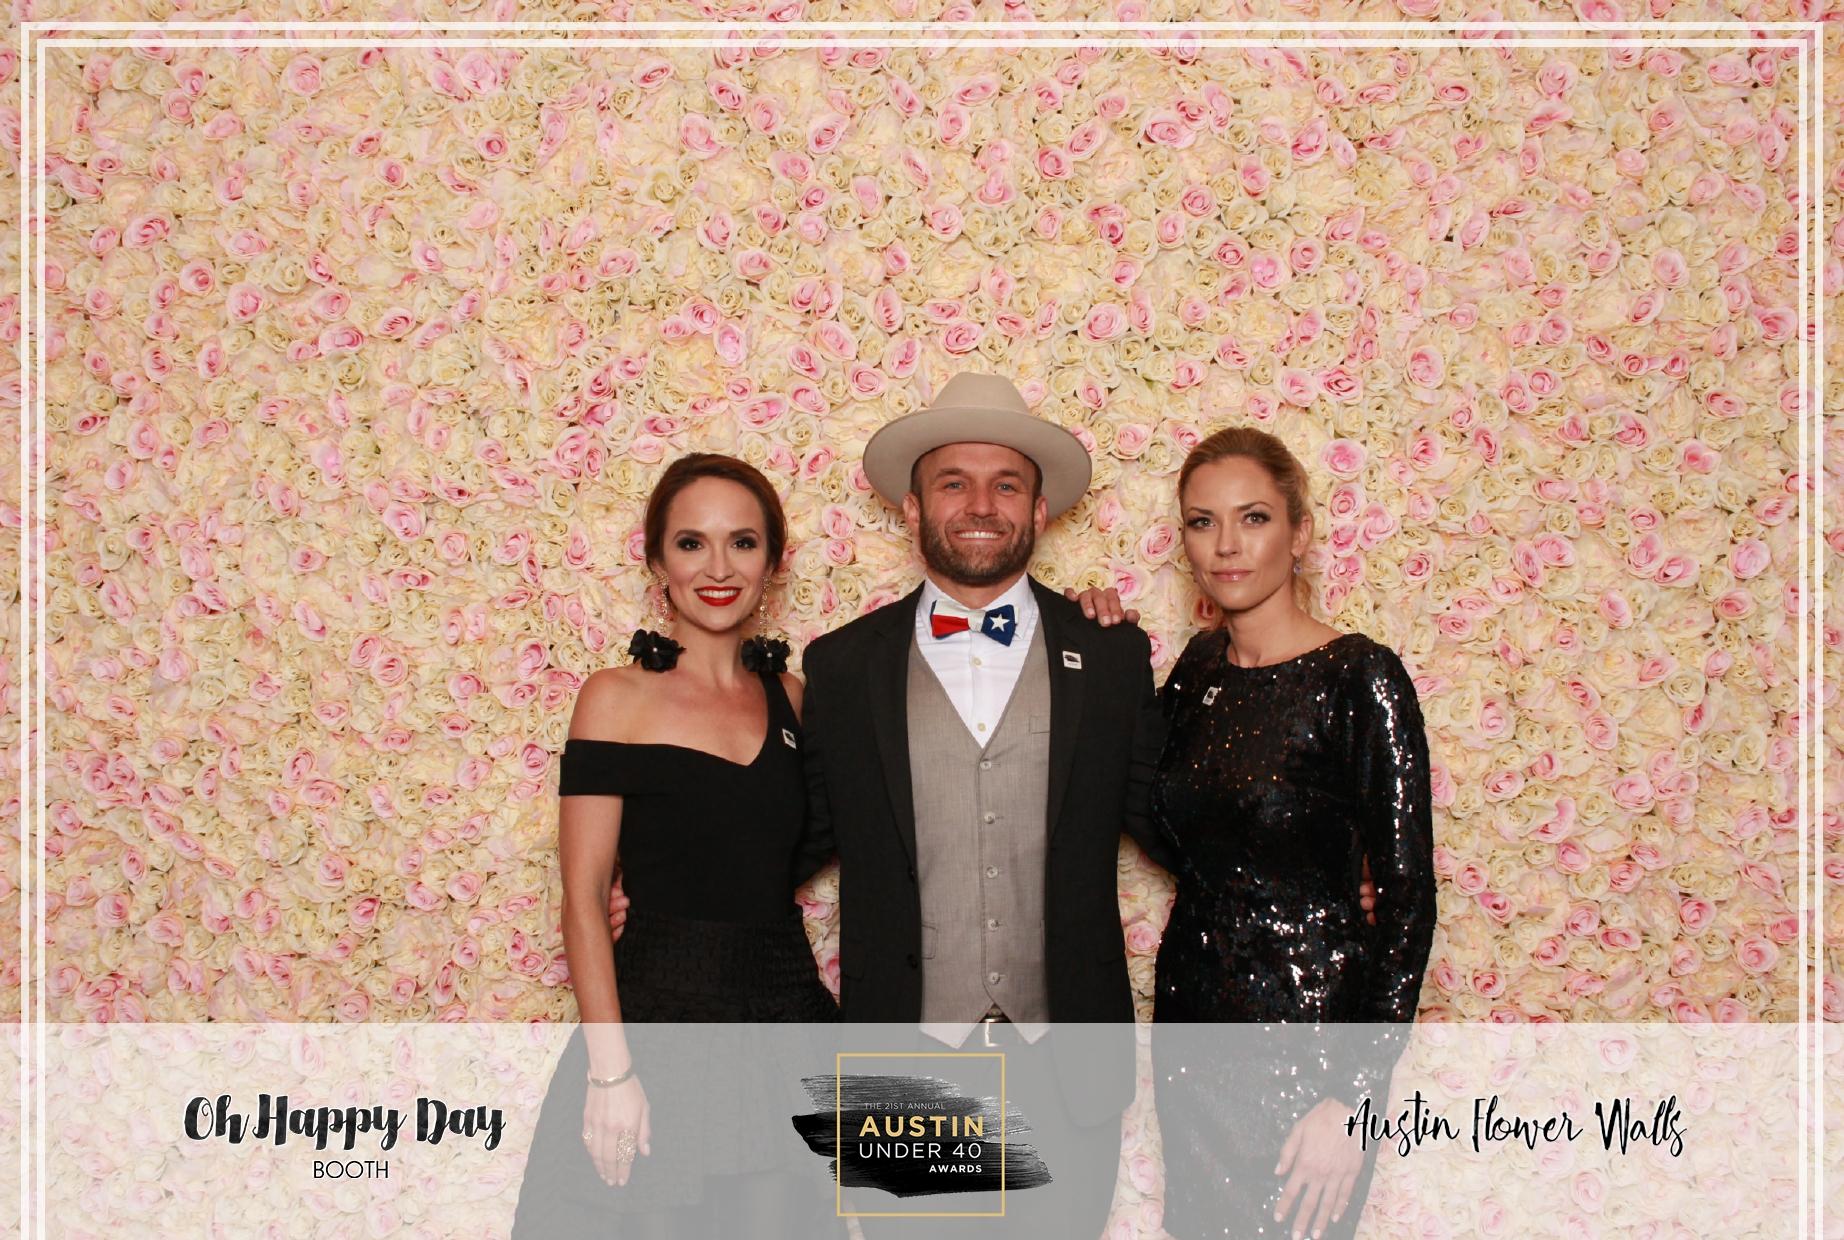 Oh Happy Day Booth - Austin Under 40-5.jpg